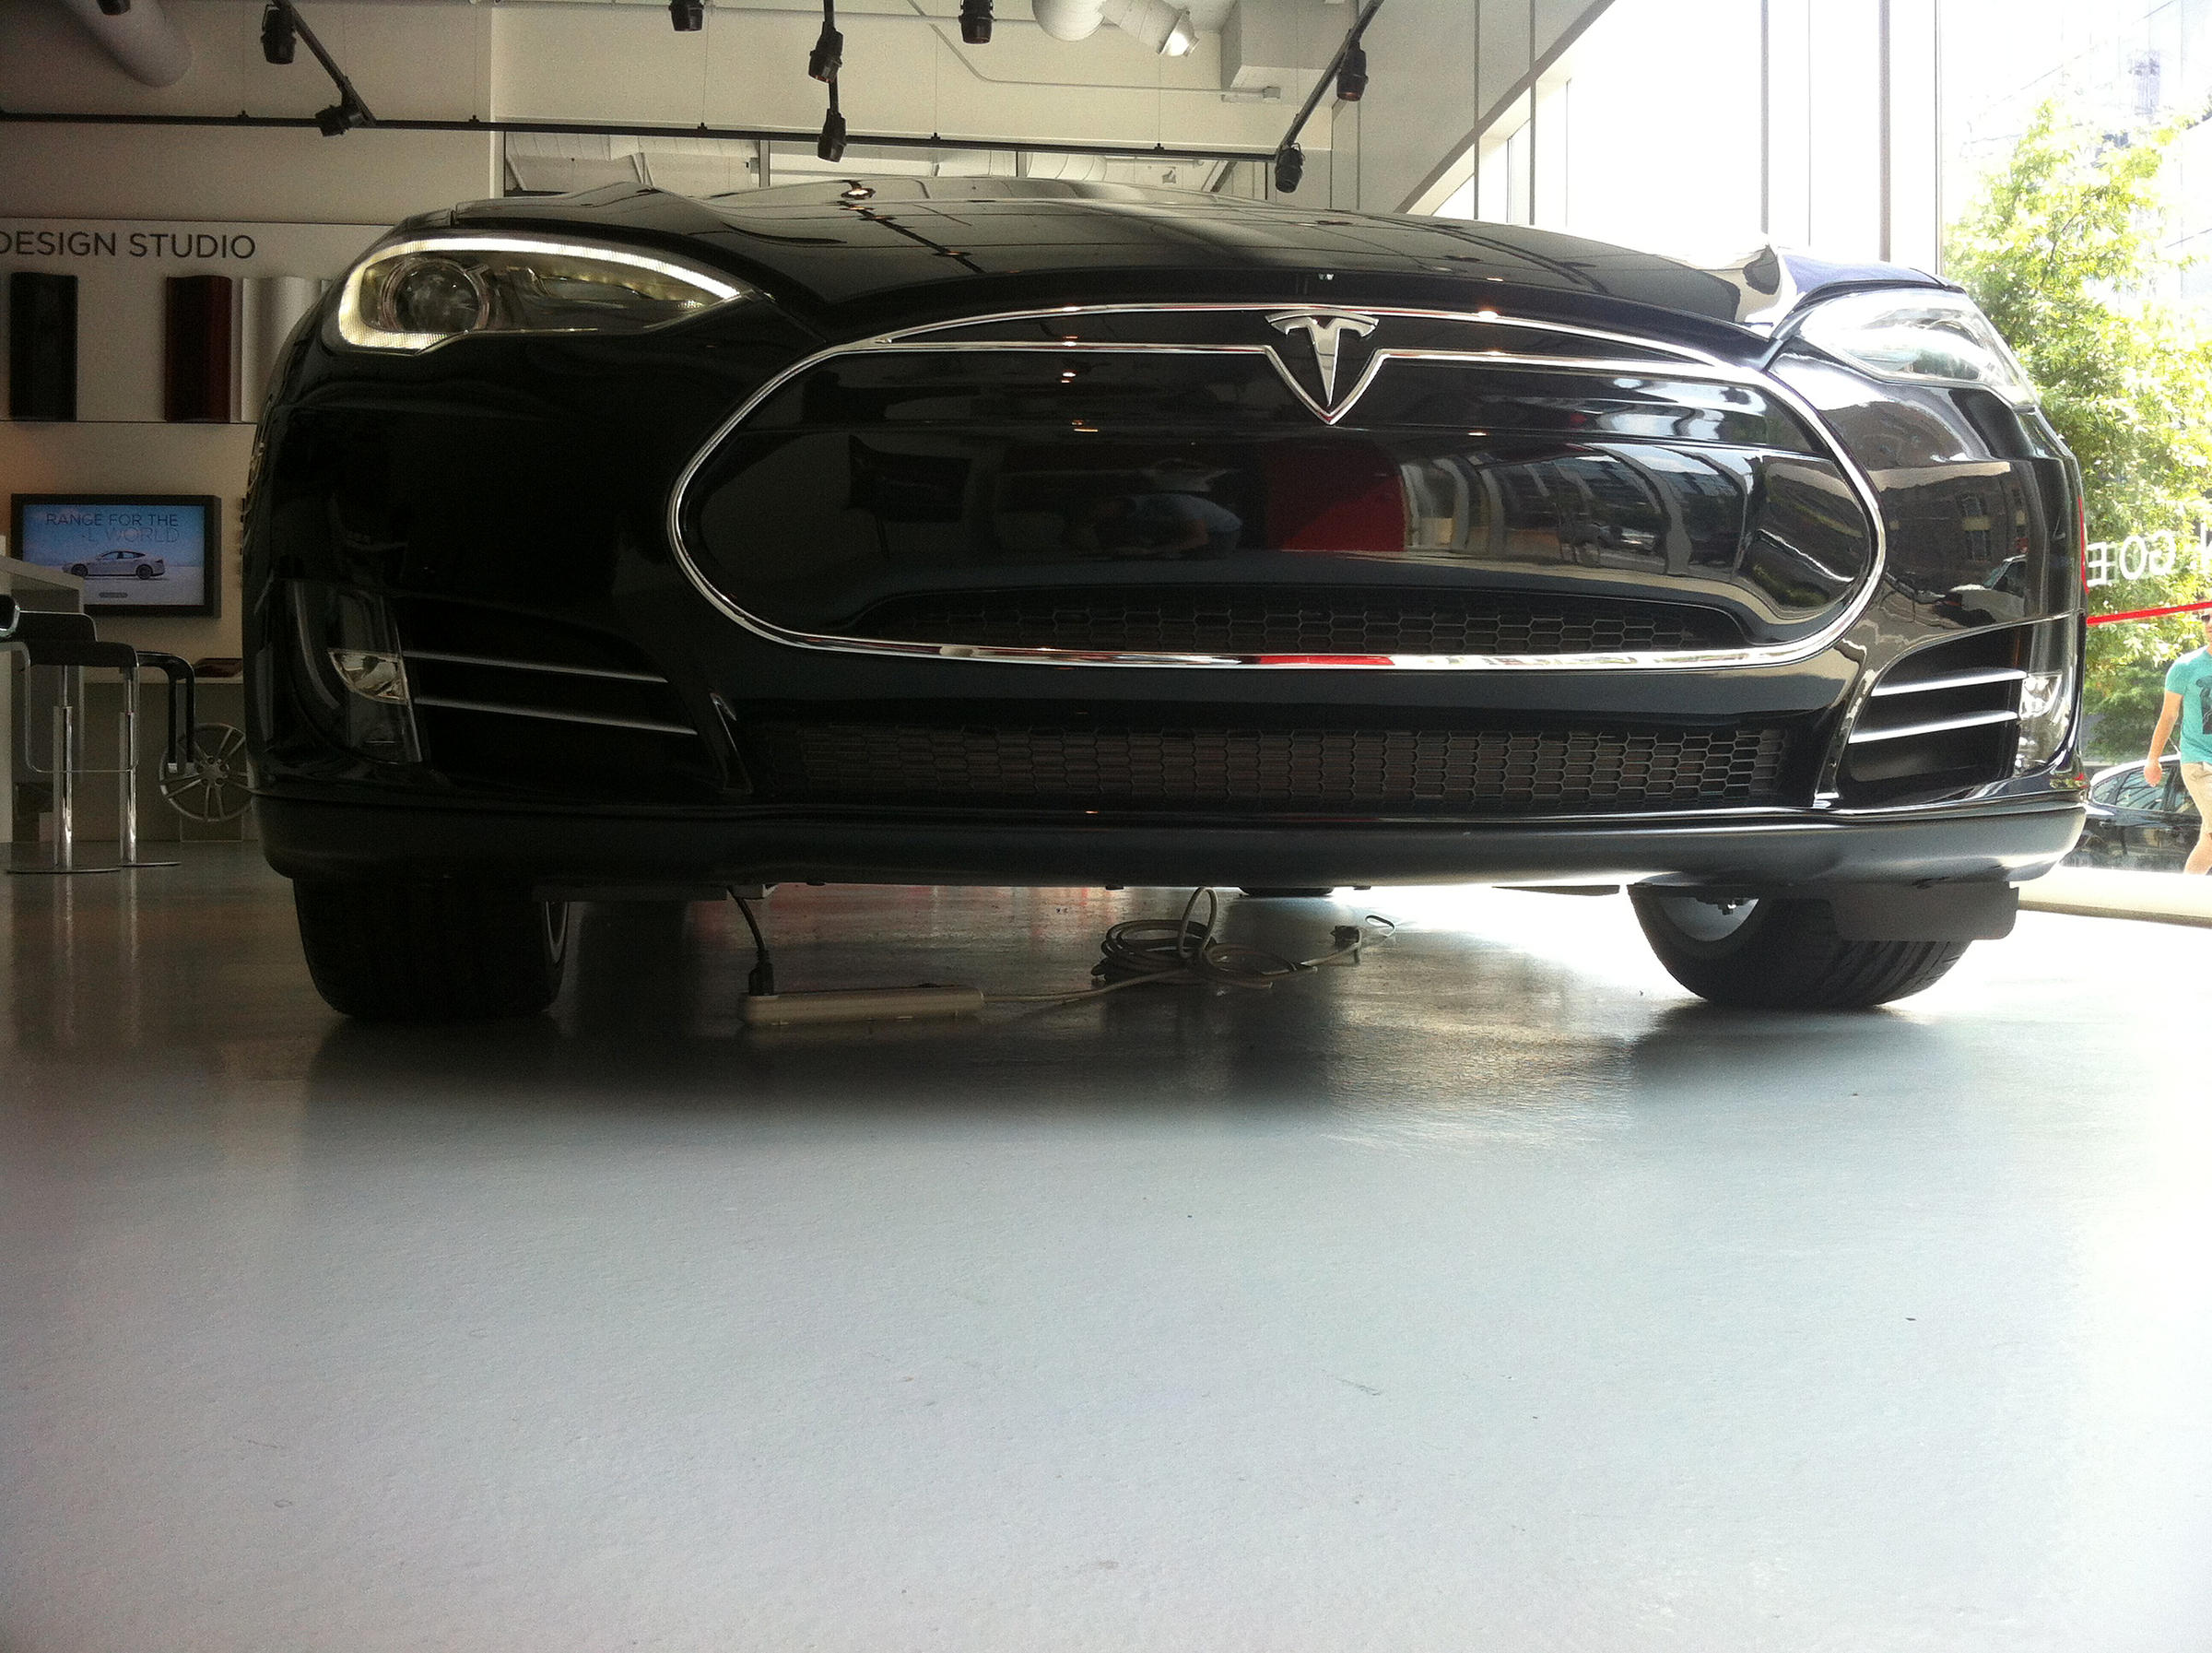 Tesla's New Electric Sedan: Five Passengers, 89 MPG, And No Engine